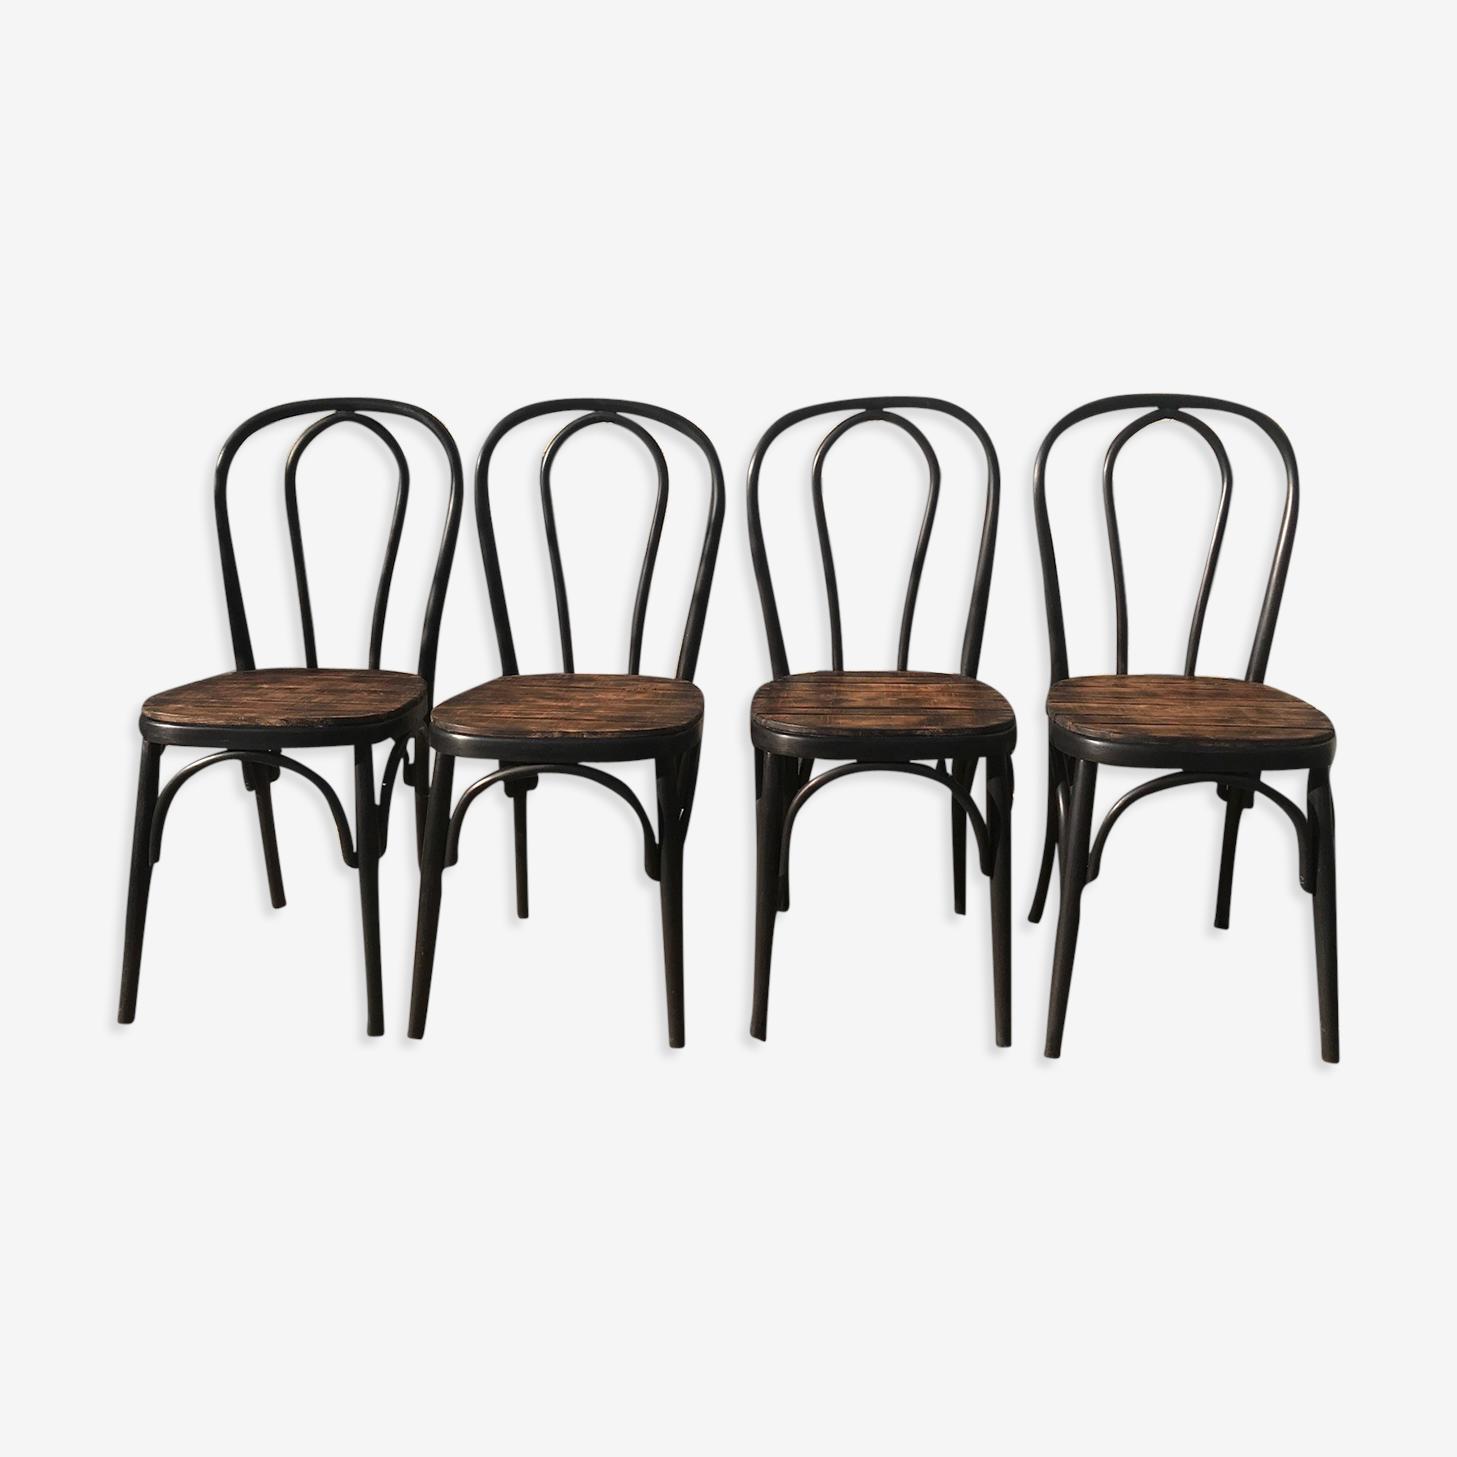 Set of 4 black bistro chairs